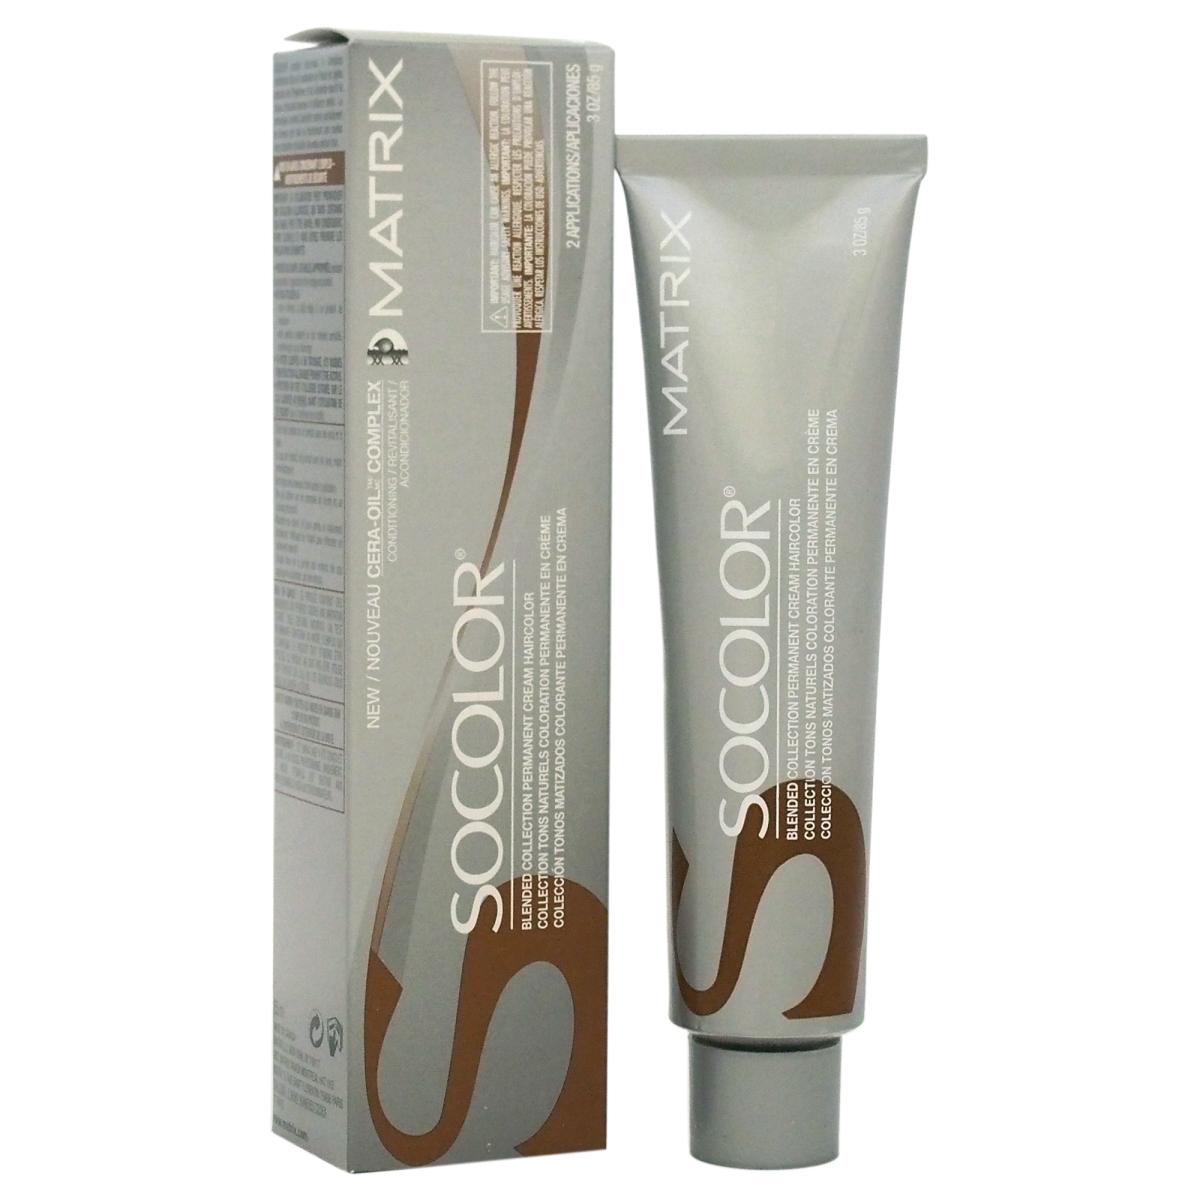 Matrix U-HC-8331 3 oz Socolor Permanent Cream Hair Color 6N Neutral by Hair Color for Unisex - Light Brown